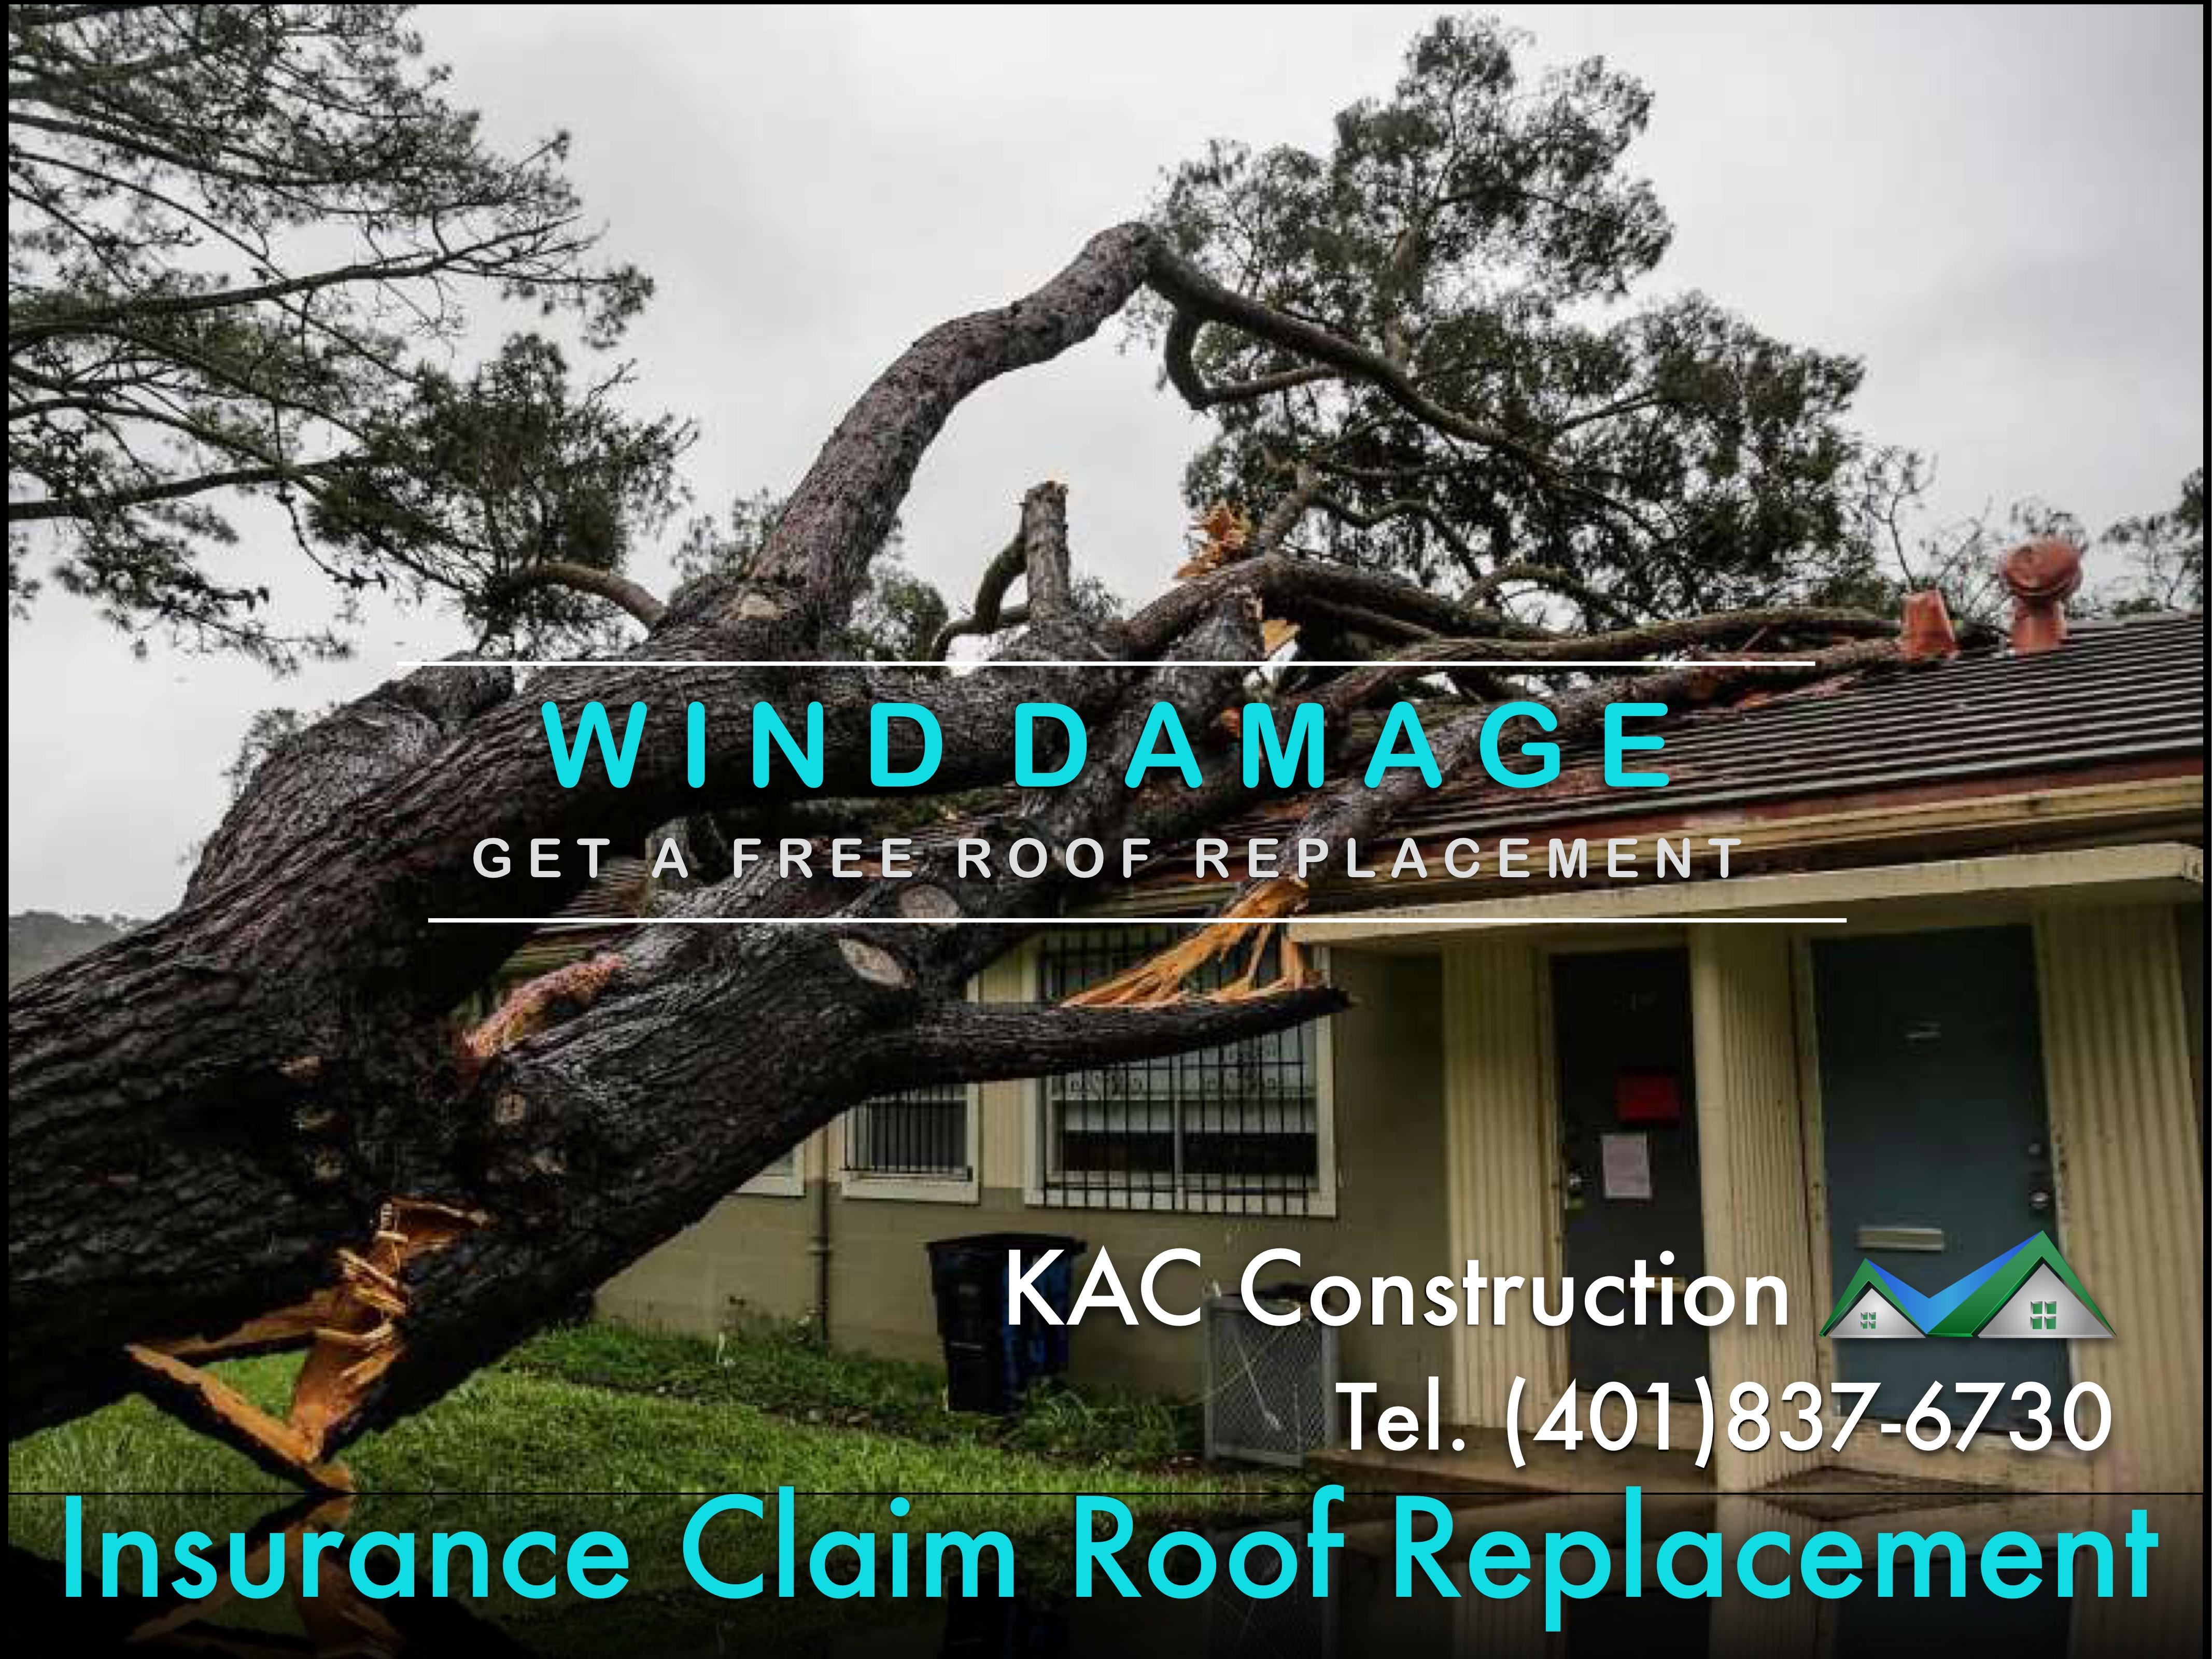 Residential roof, Residential roof ri, Residential roof replacement, residential roof replacement ri, roof replacement, roof replacement ri,